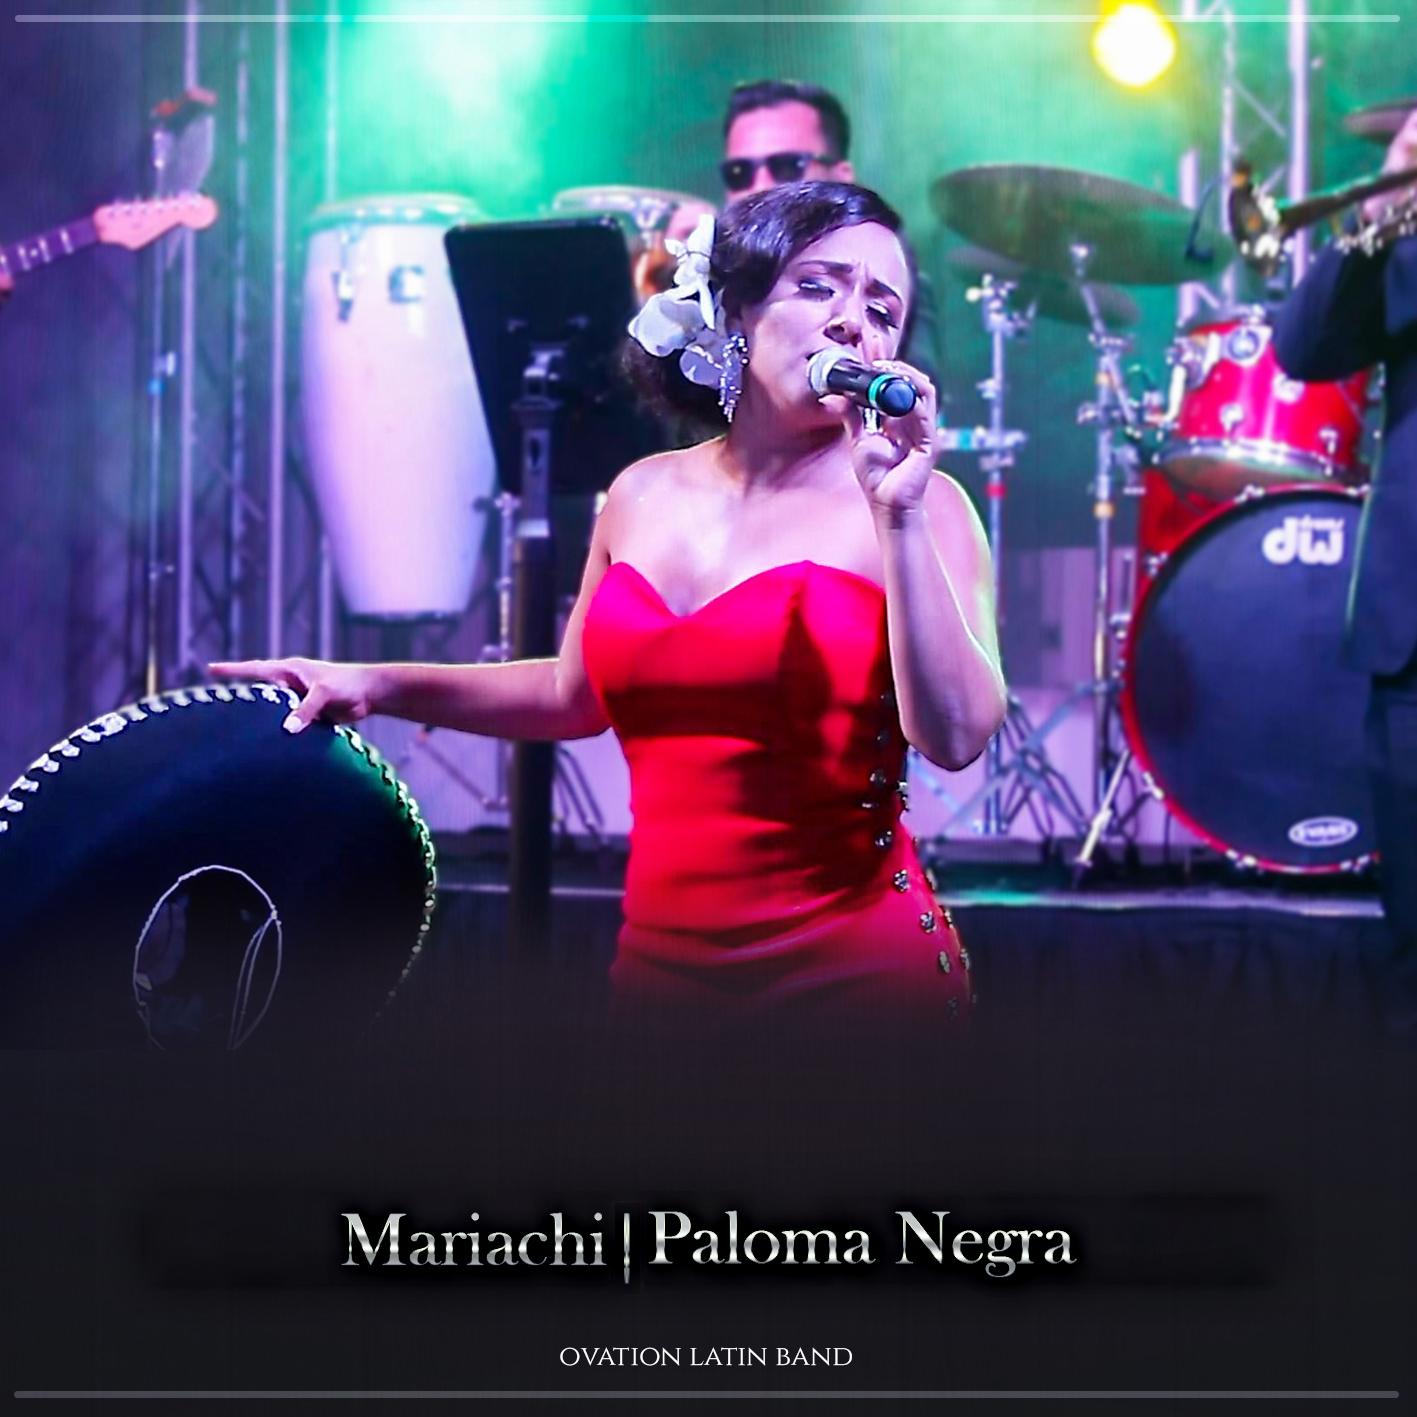 Mariachi-Show-Ovation-Latin-Band